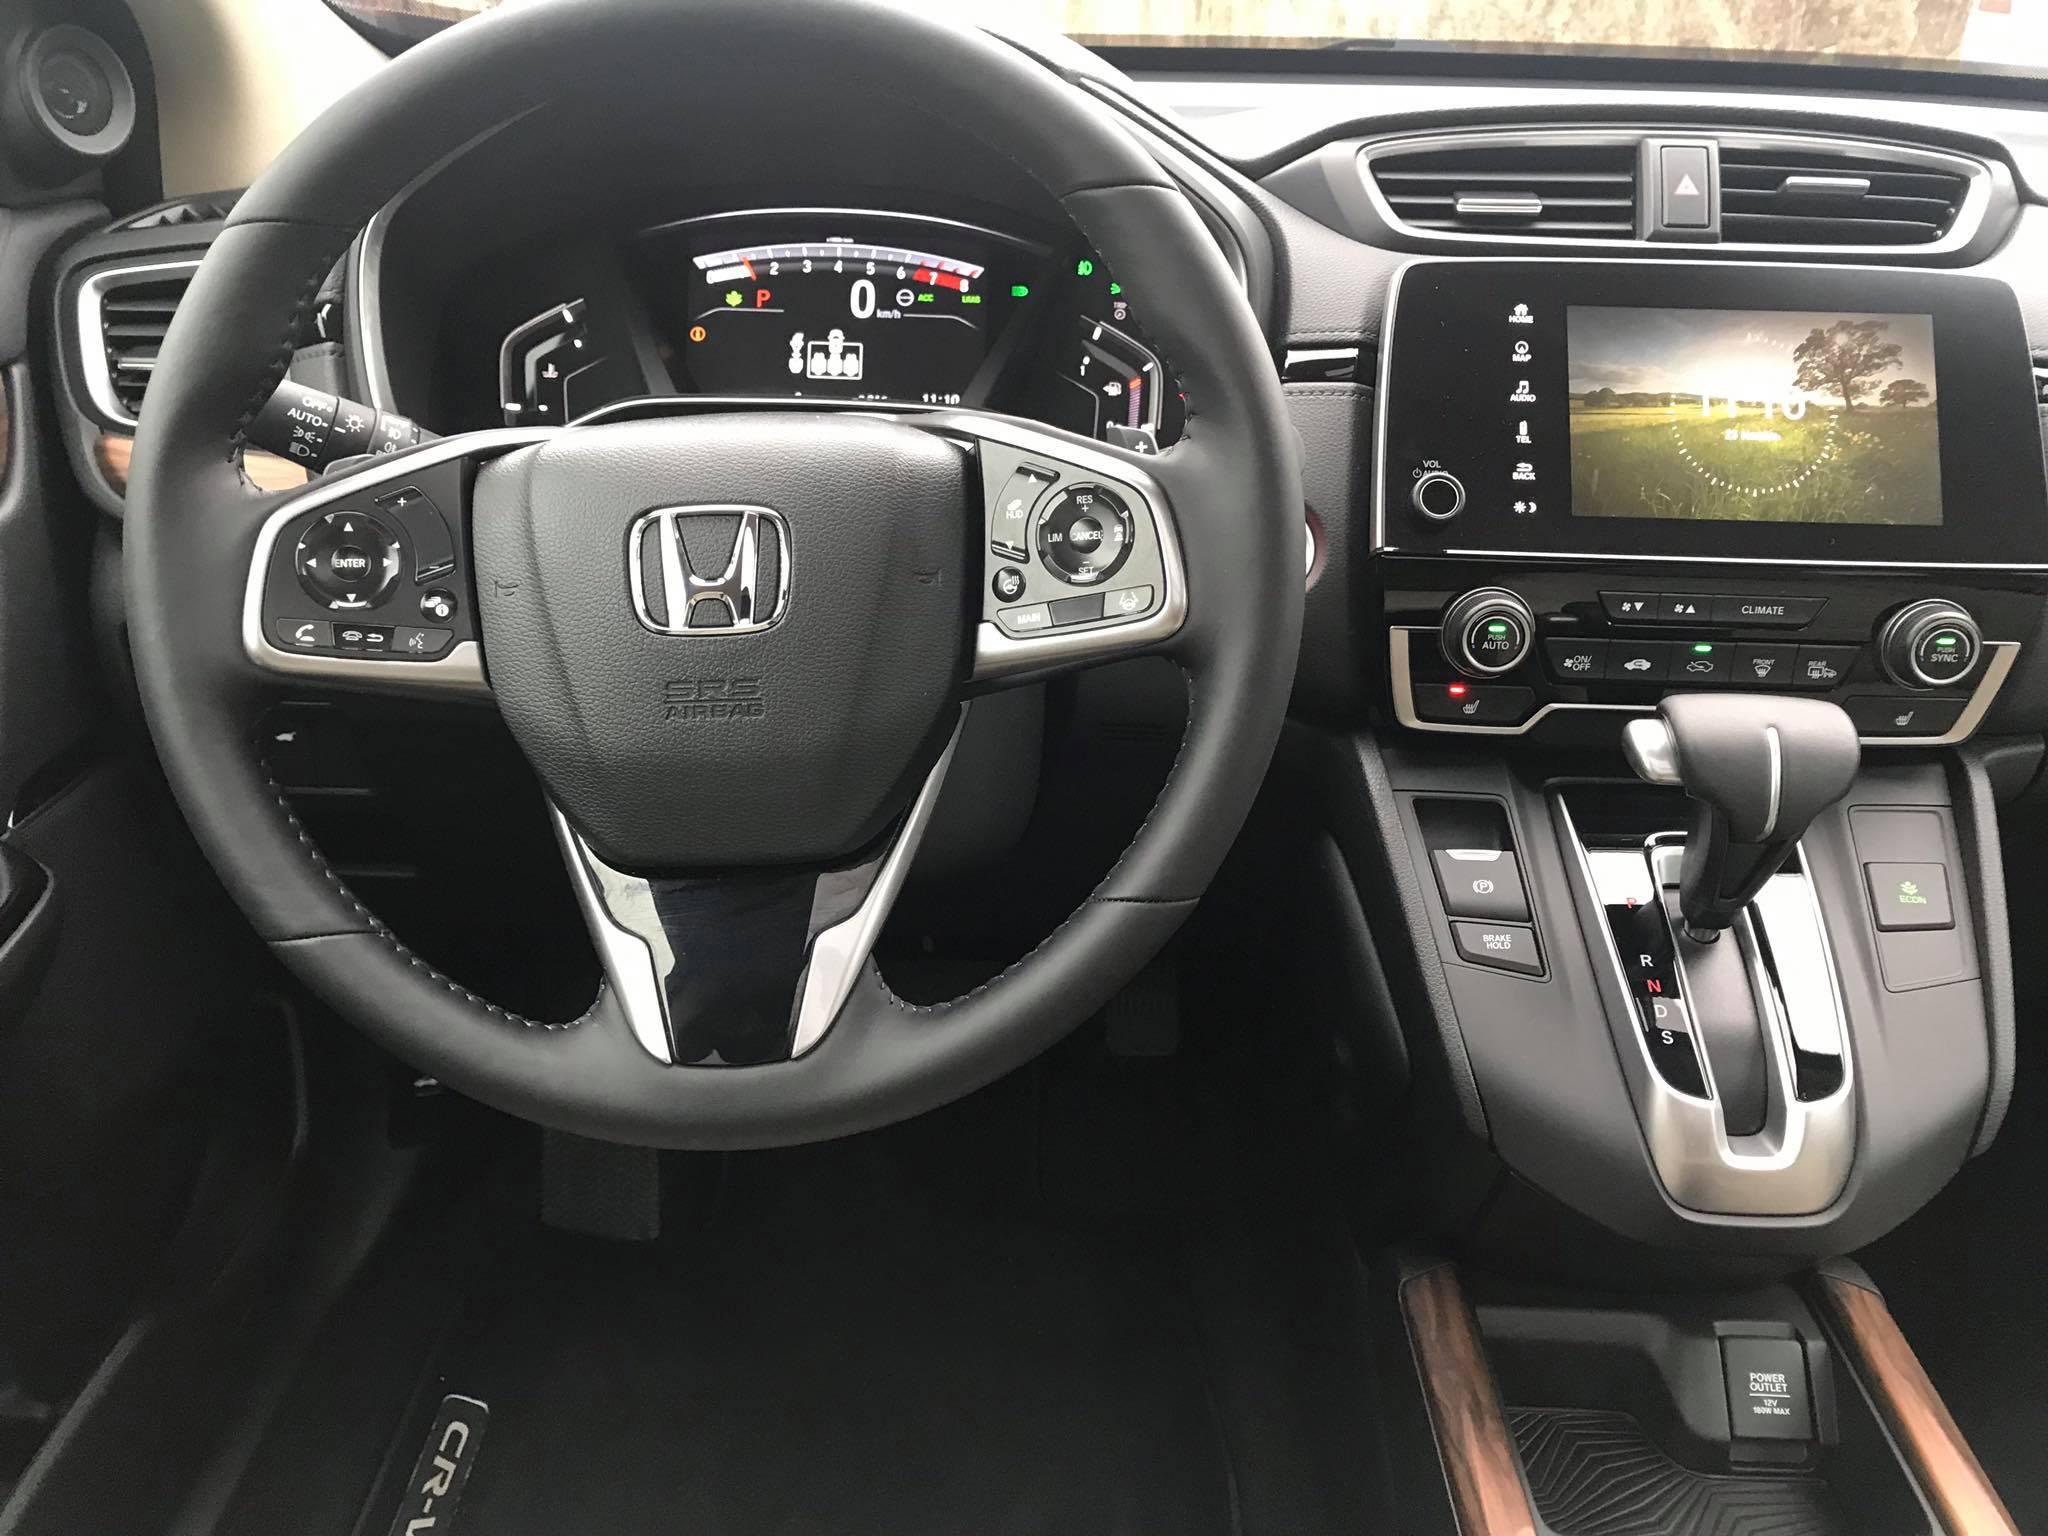 https://www.whatcar.lv/cars/Honda/CR-V/fca8cbcf571405e5faef9299b9ac27d9.jpg